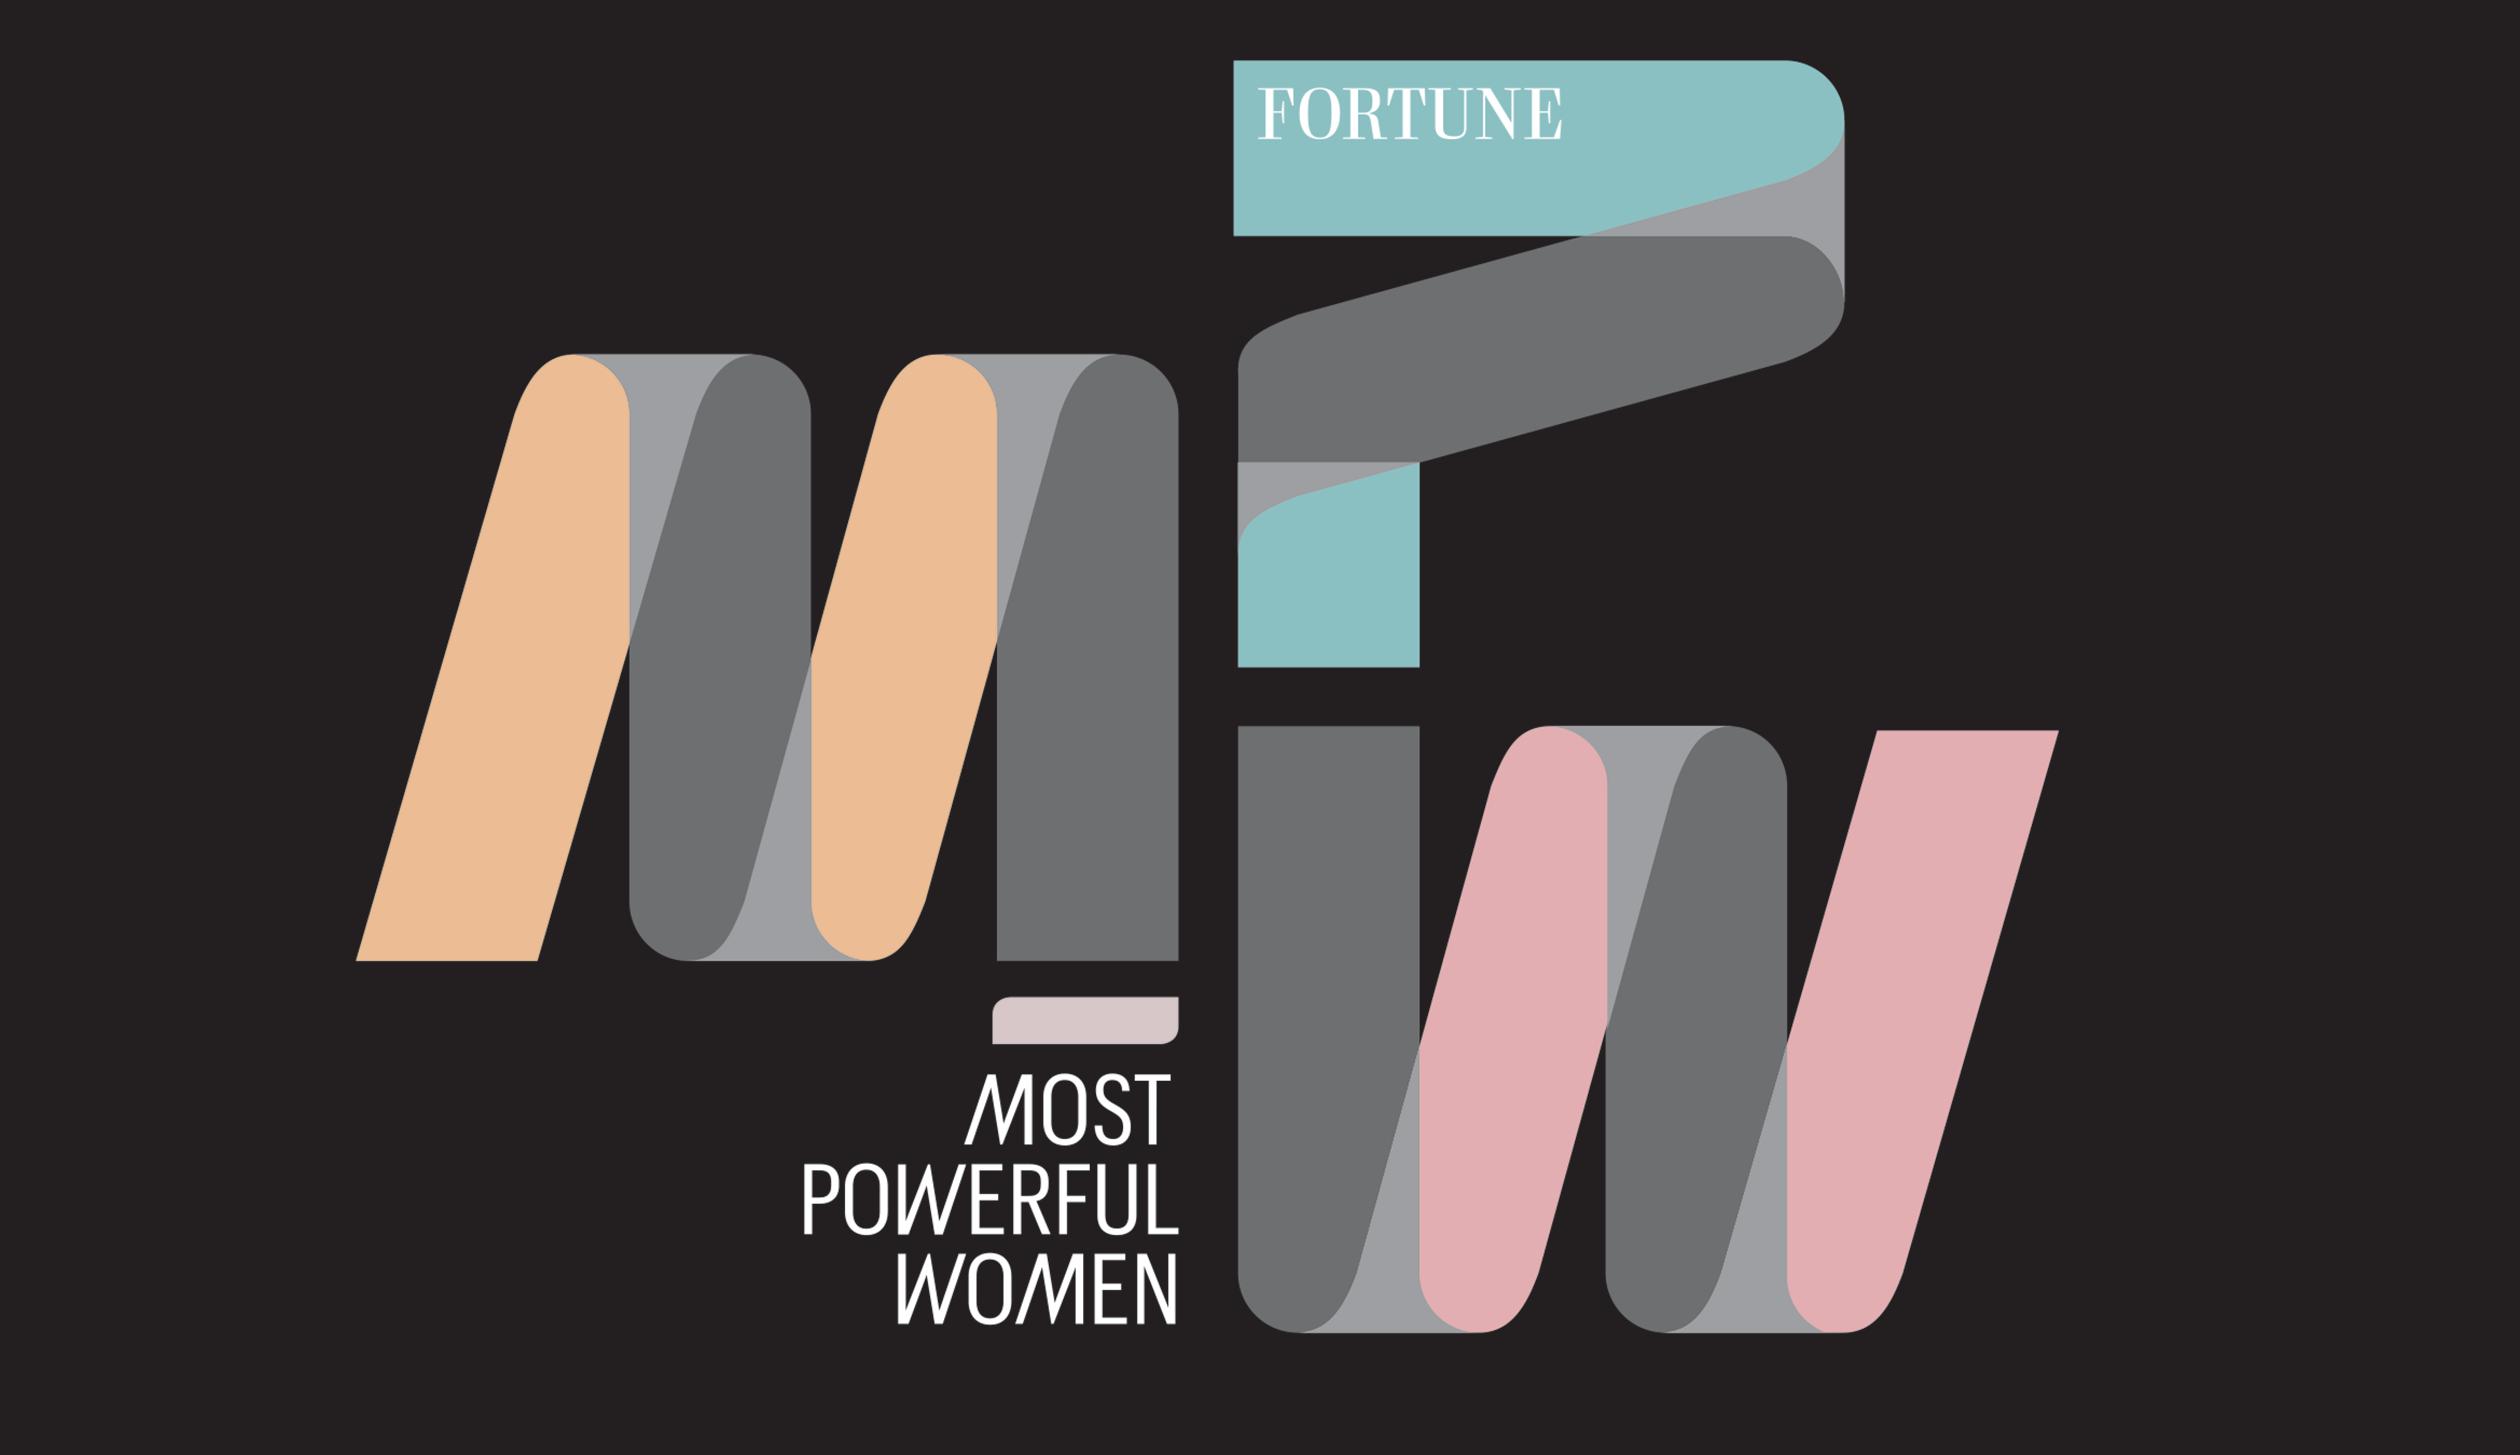 Patti Davis, Rihanna, Fortune Most Powerful Women 2018: Broadsheet September 24